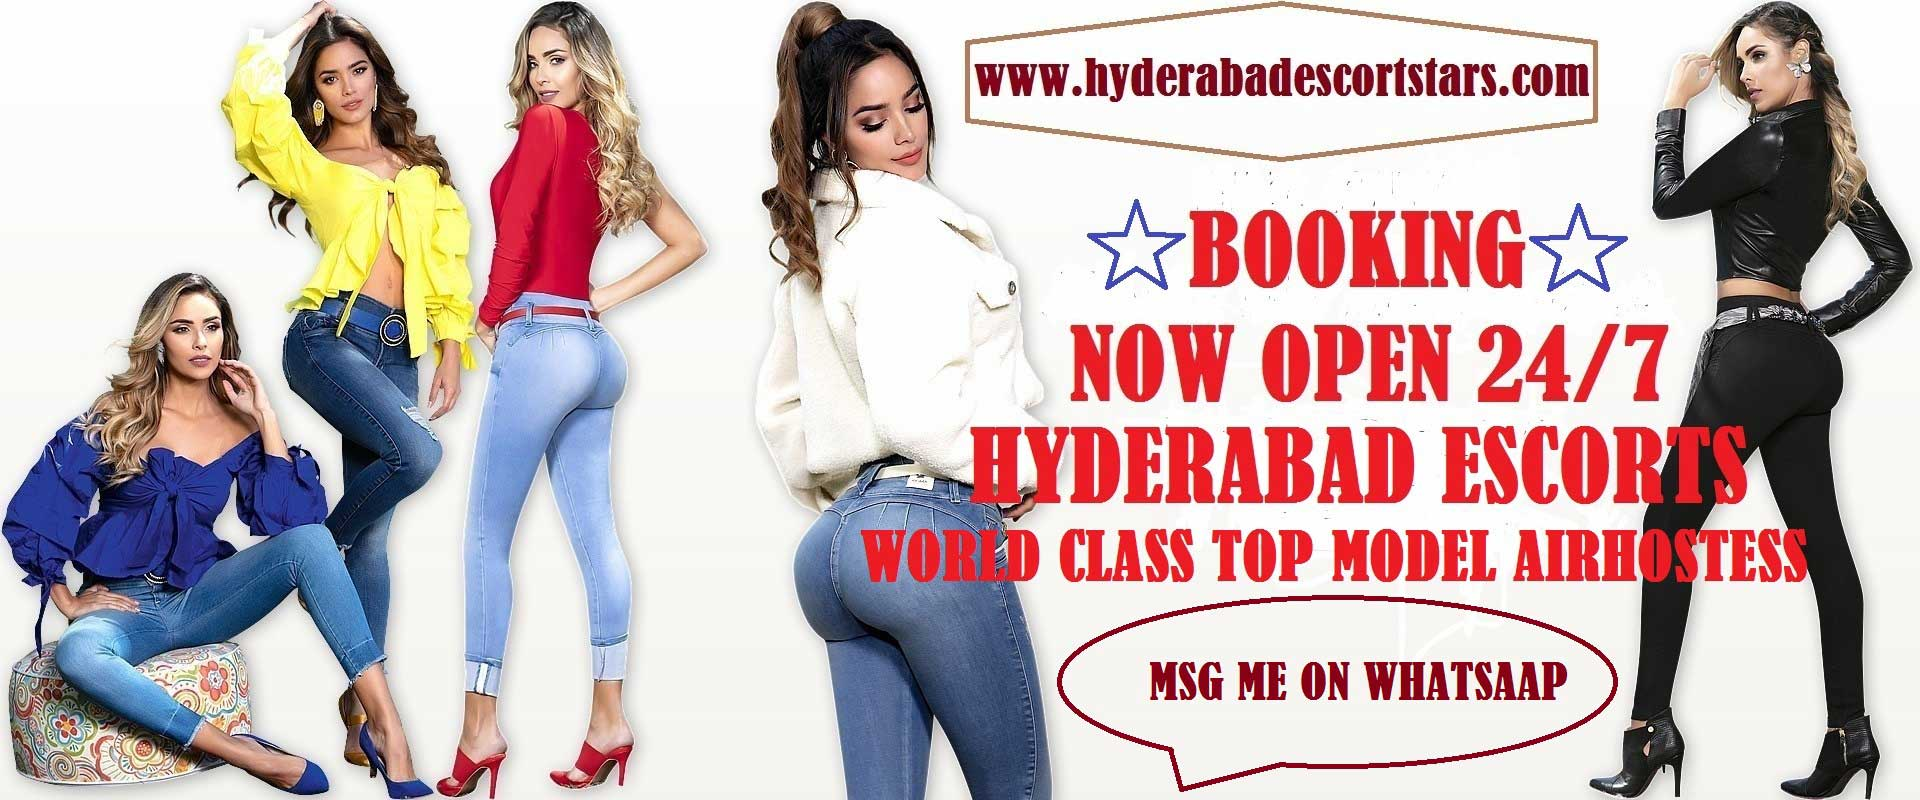 Hyderabad Escorts   Hyderabad Escort Star Agency Open 24/7